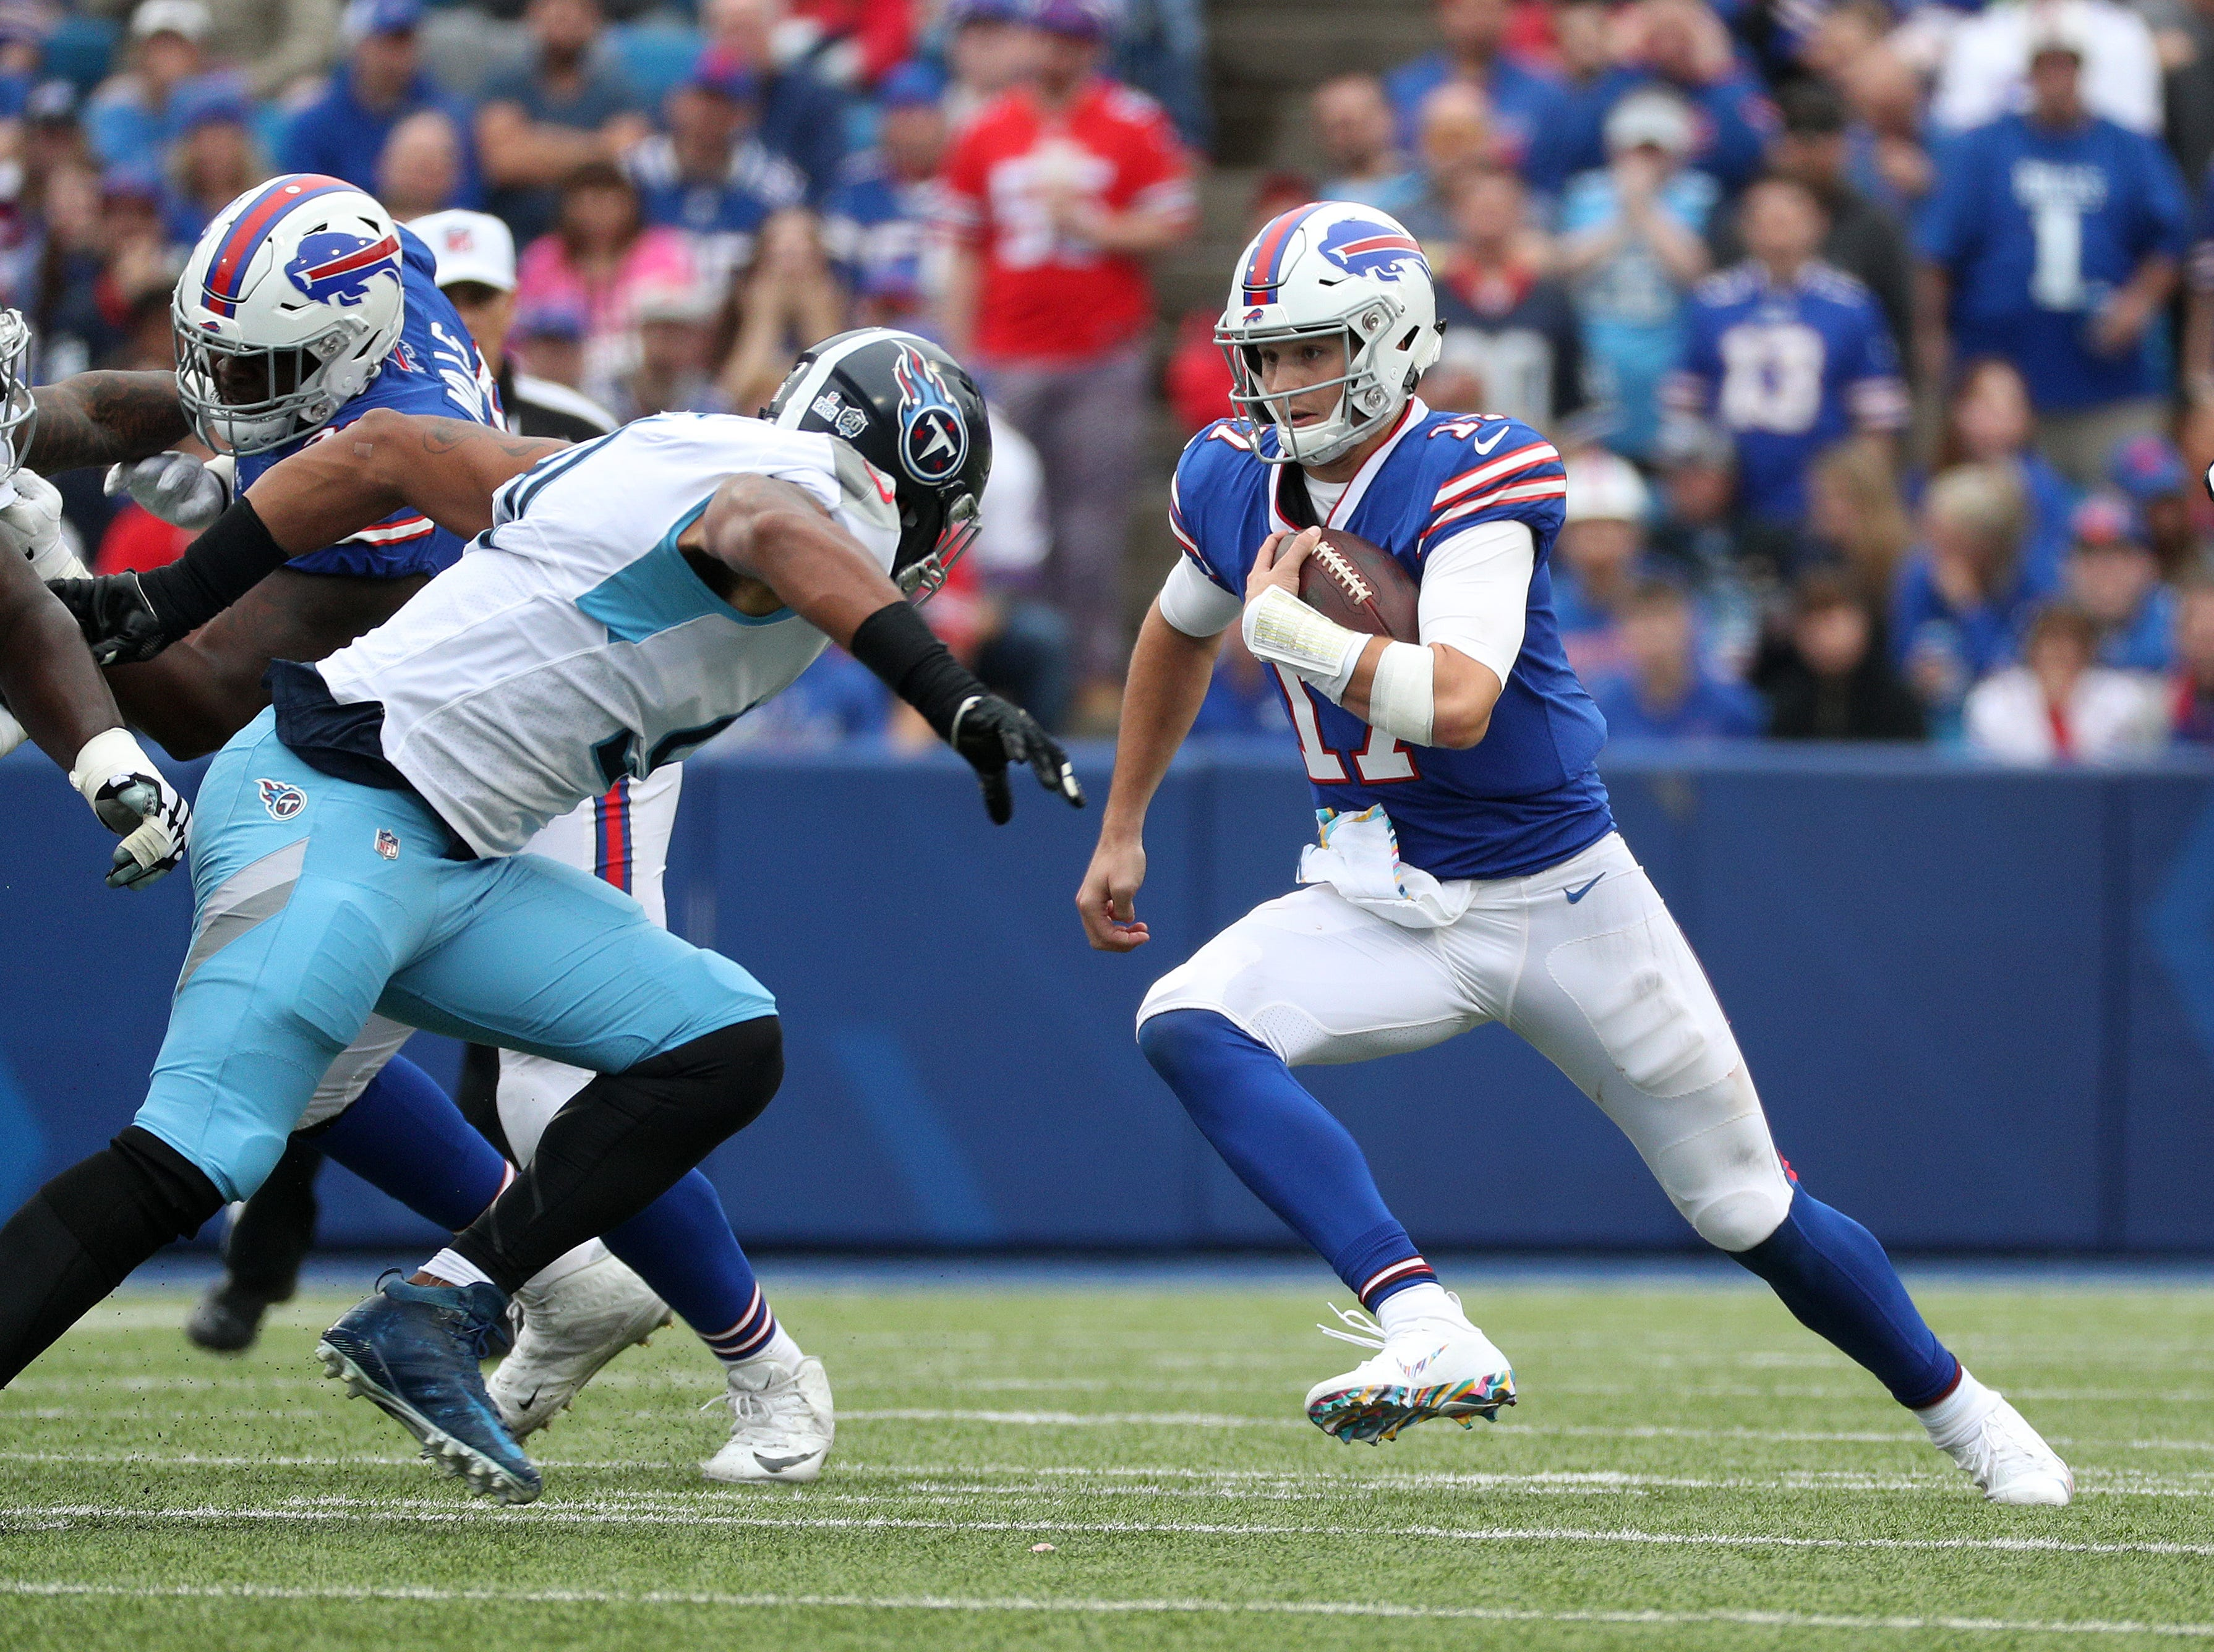 Bills quarterback Josh Allen tucks the ball and runs for a short gain.